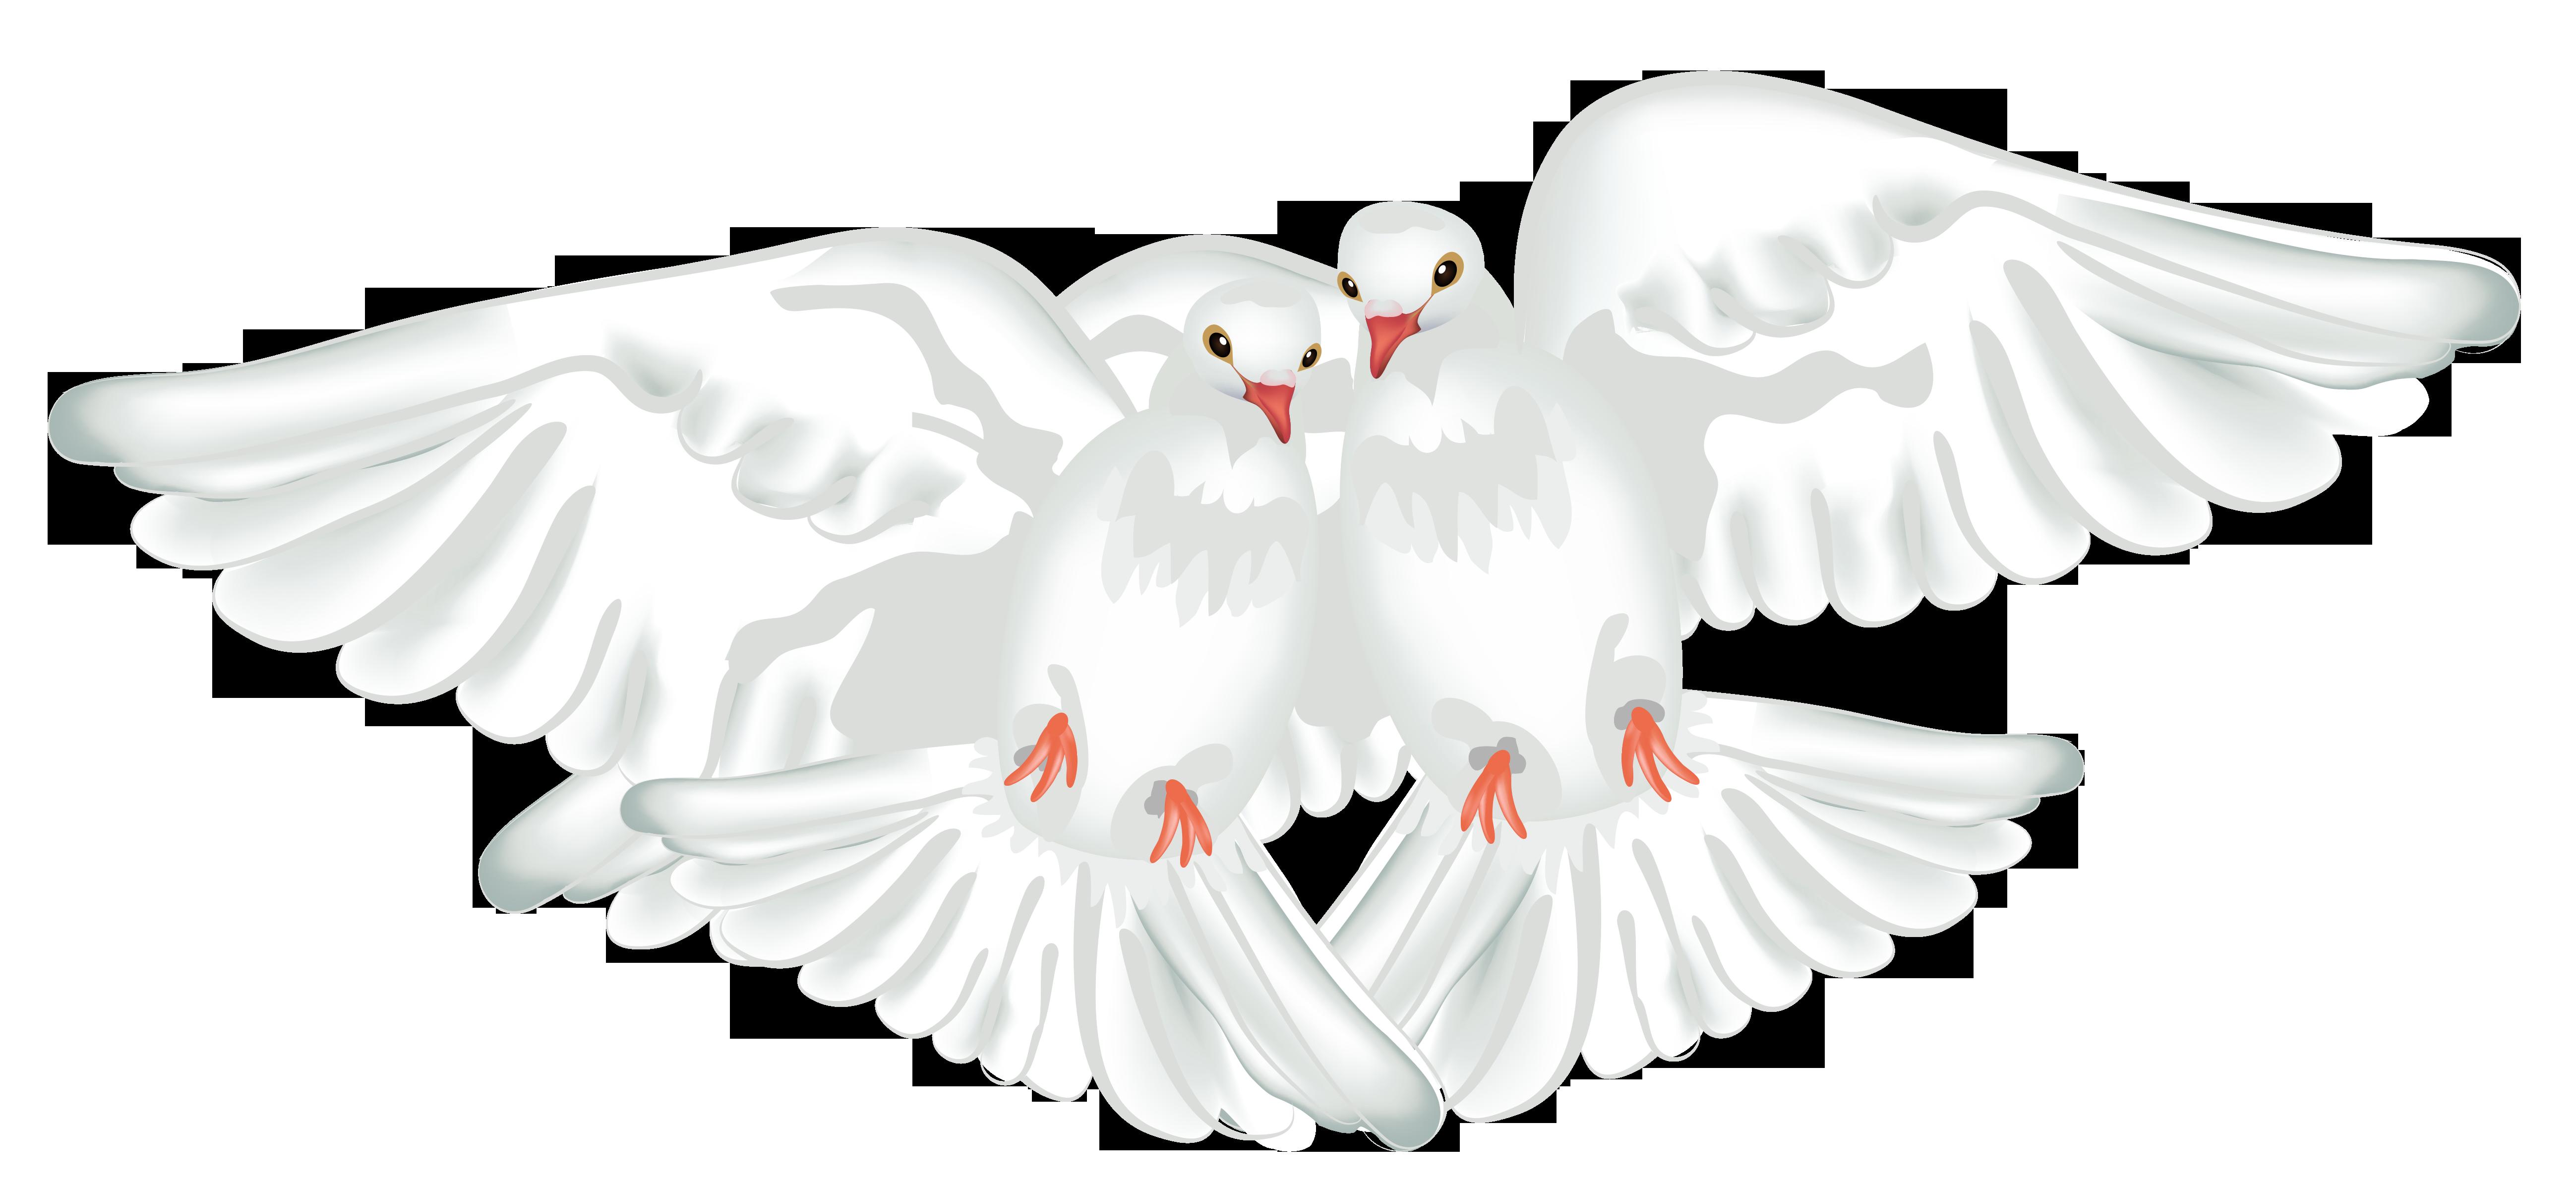 Doves clipart feather. Columbidae ruddy ground dove